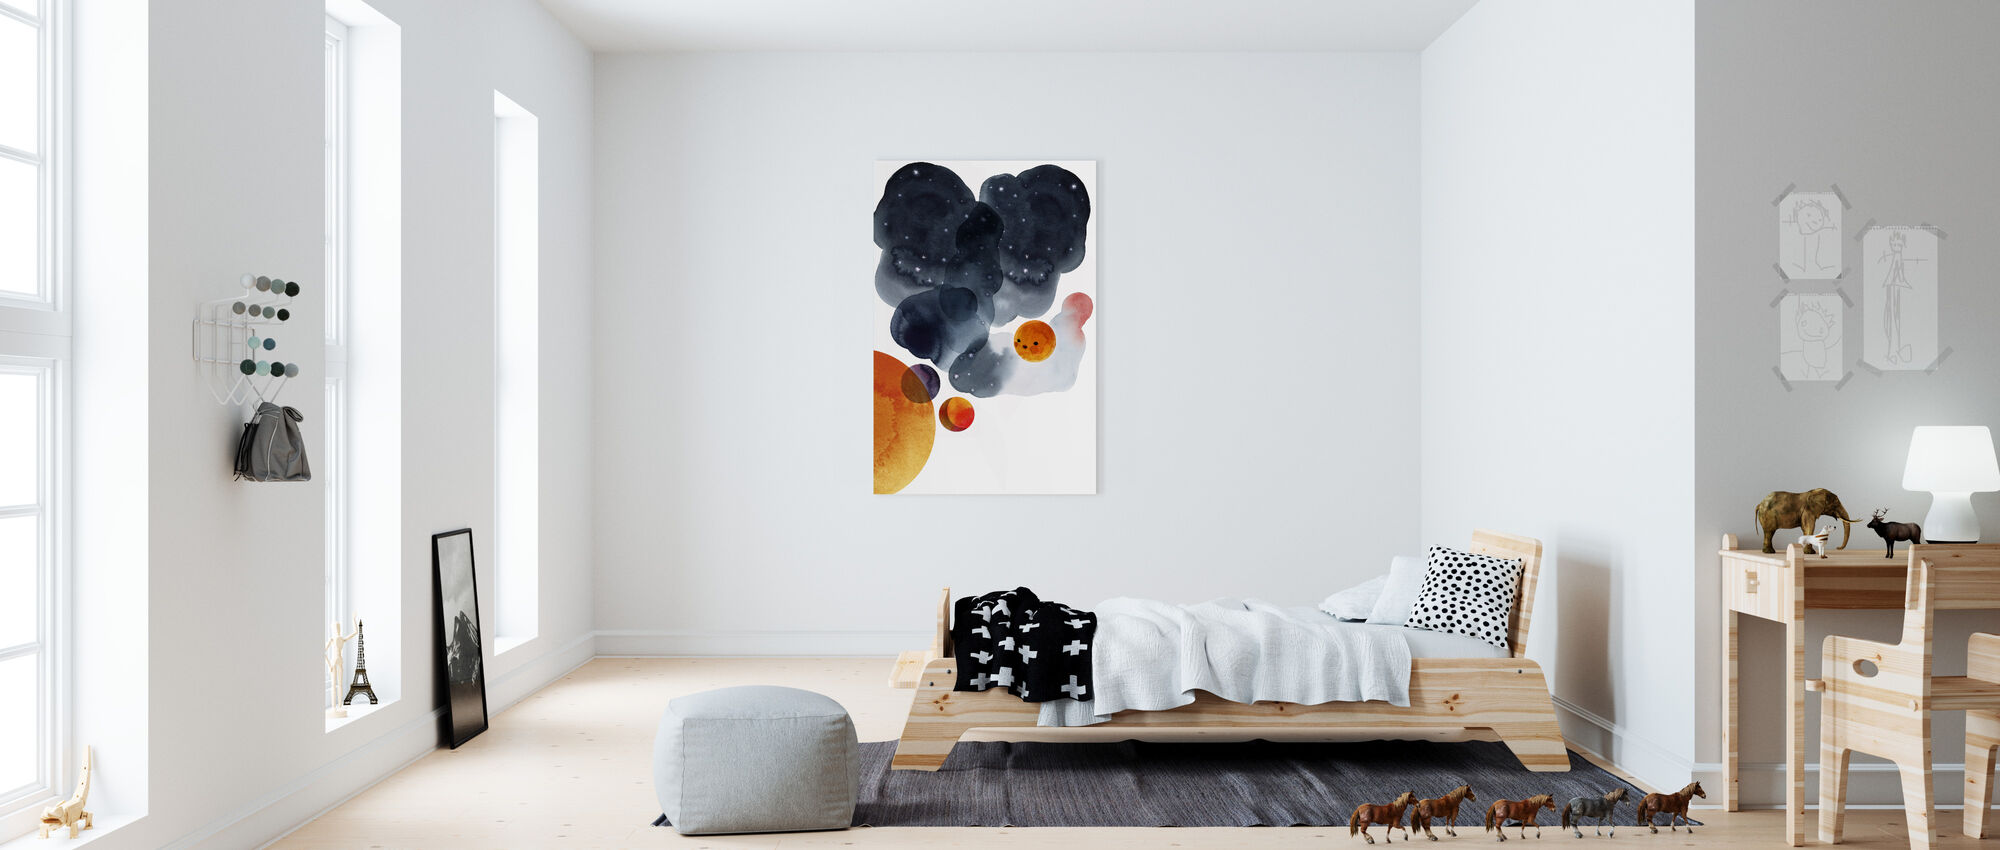 Water Color Space II - Canvas print - Kids Room